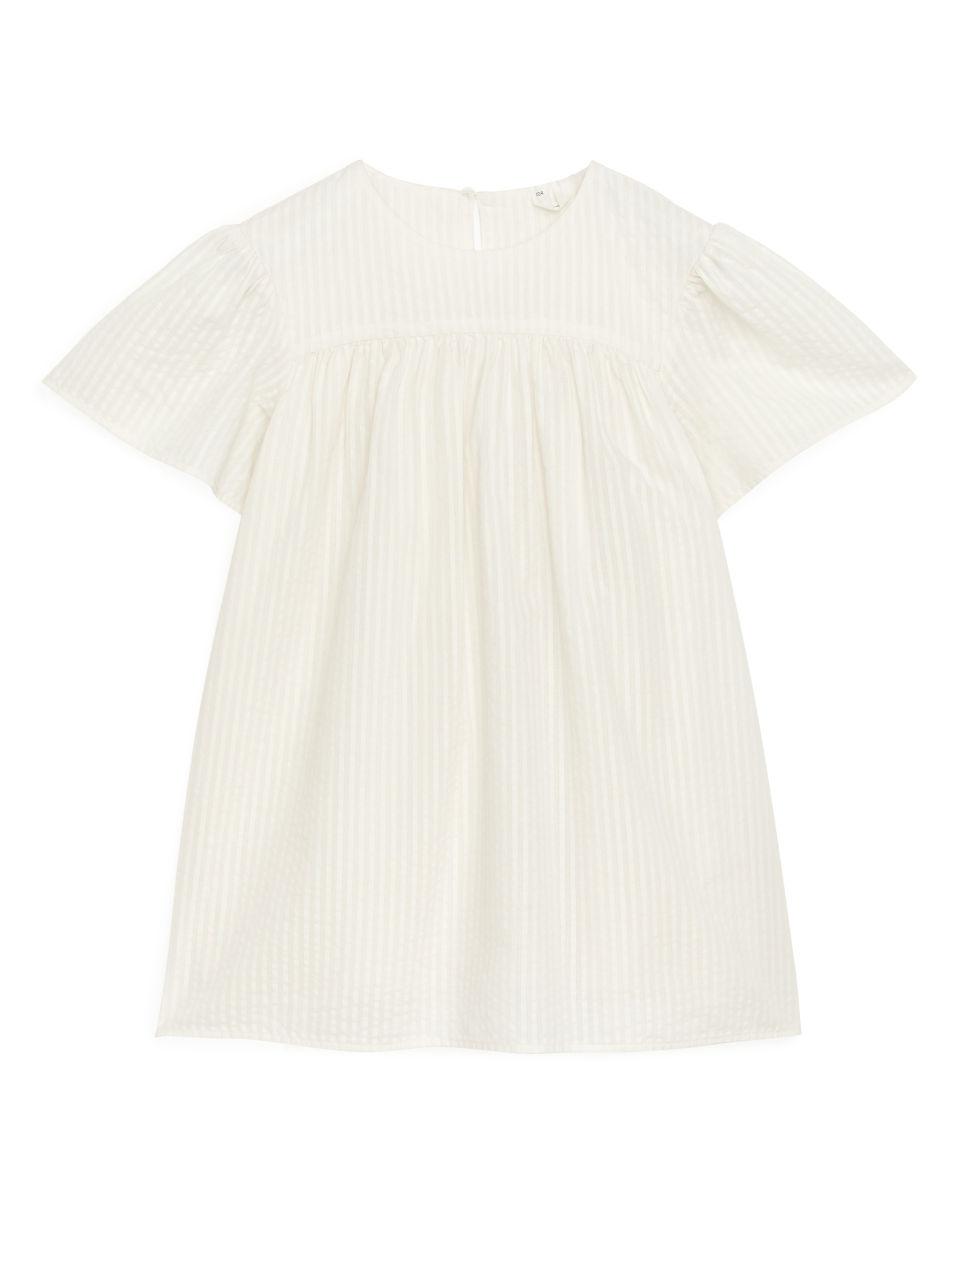 Voluminous Seersucker Dress - White